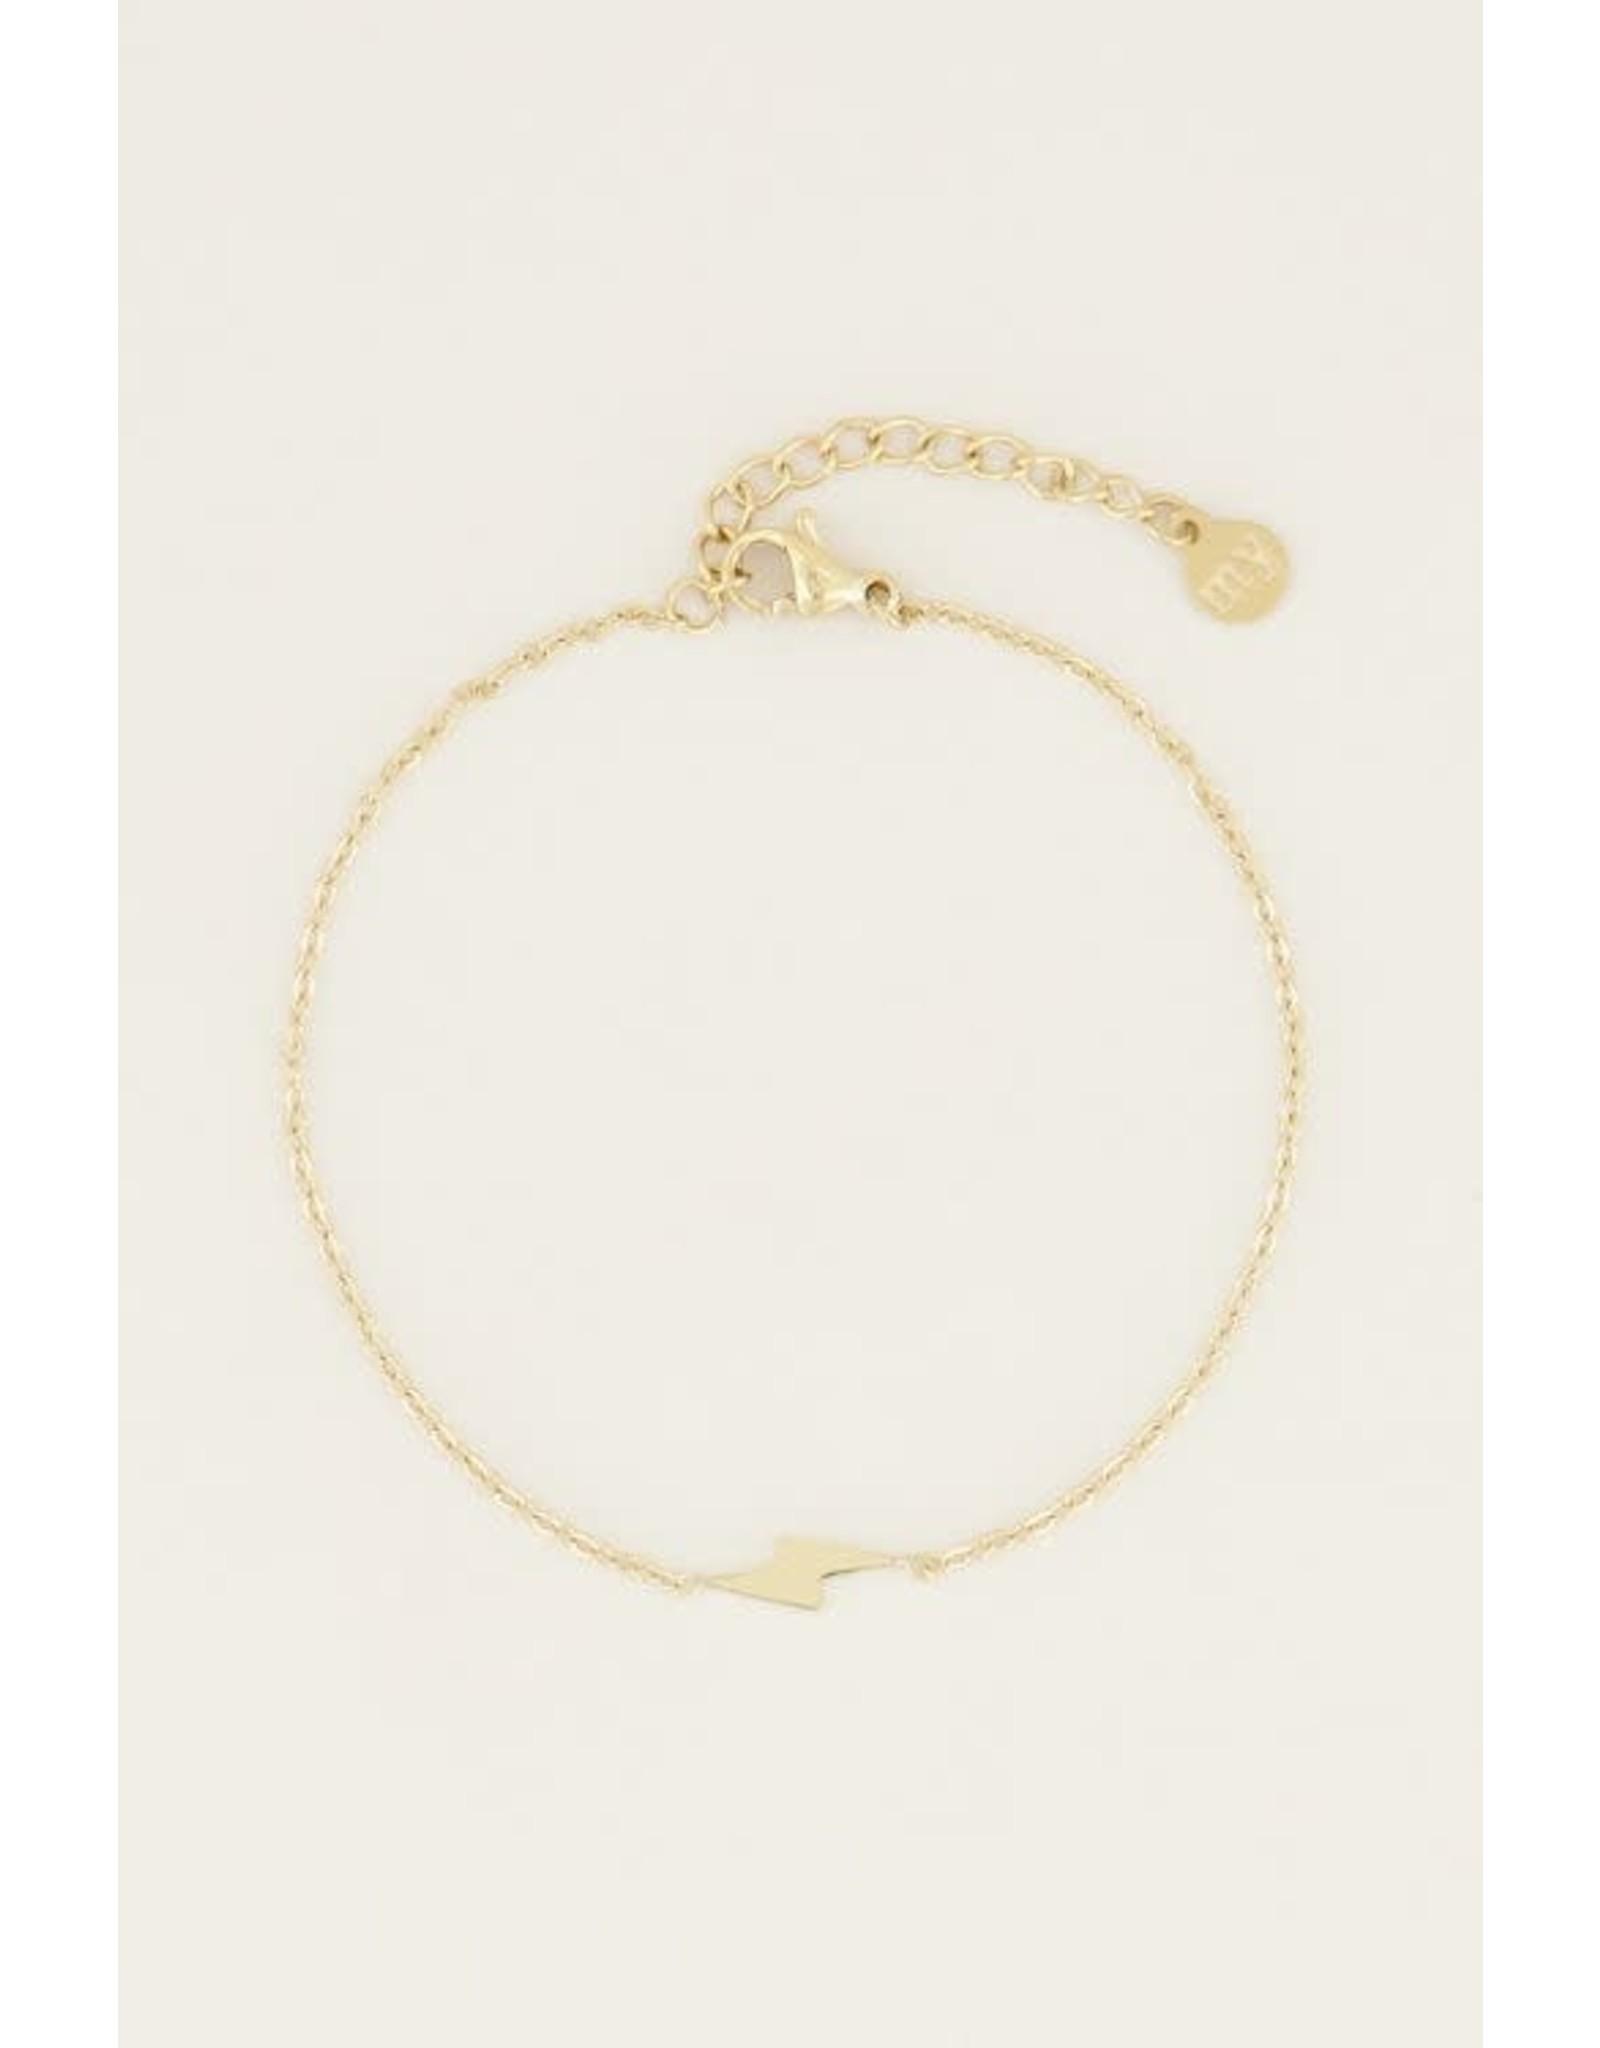 My Jewellery My Jewellery armband - bliksem